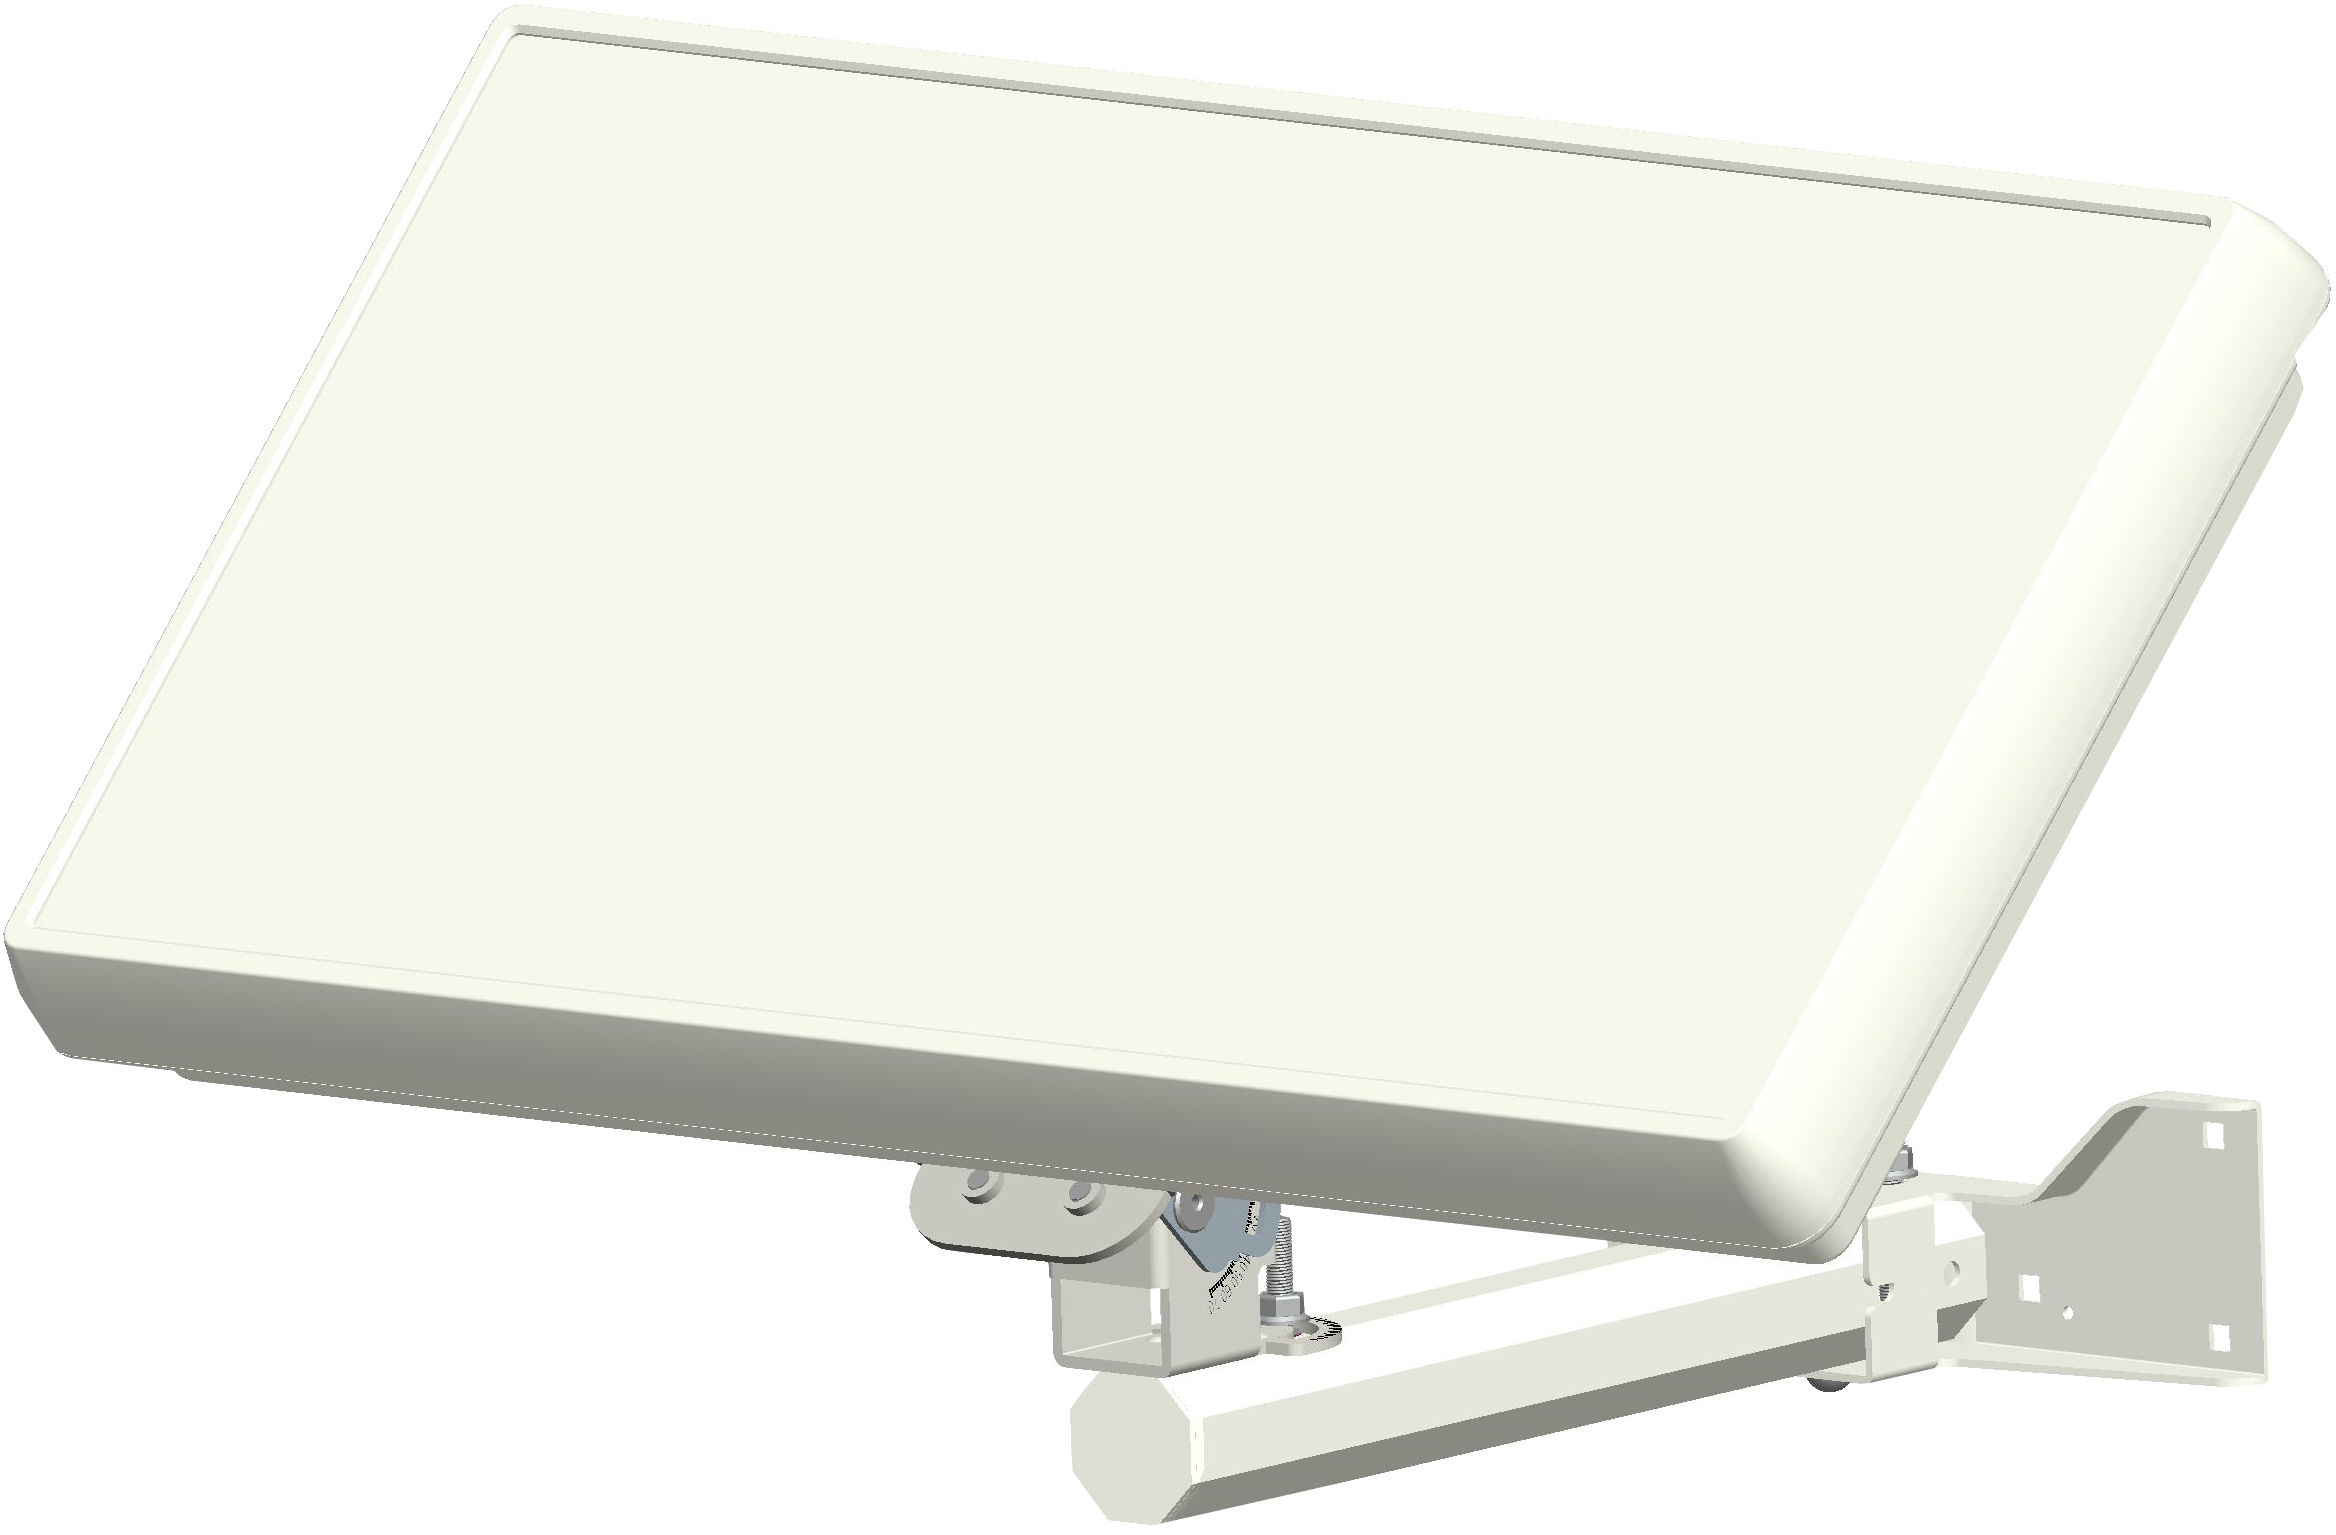 Selfsat H21D Flachantenne Single LNB-Version